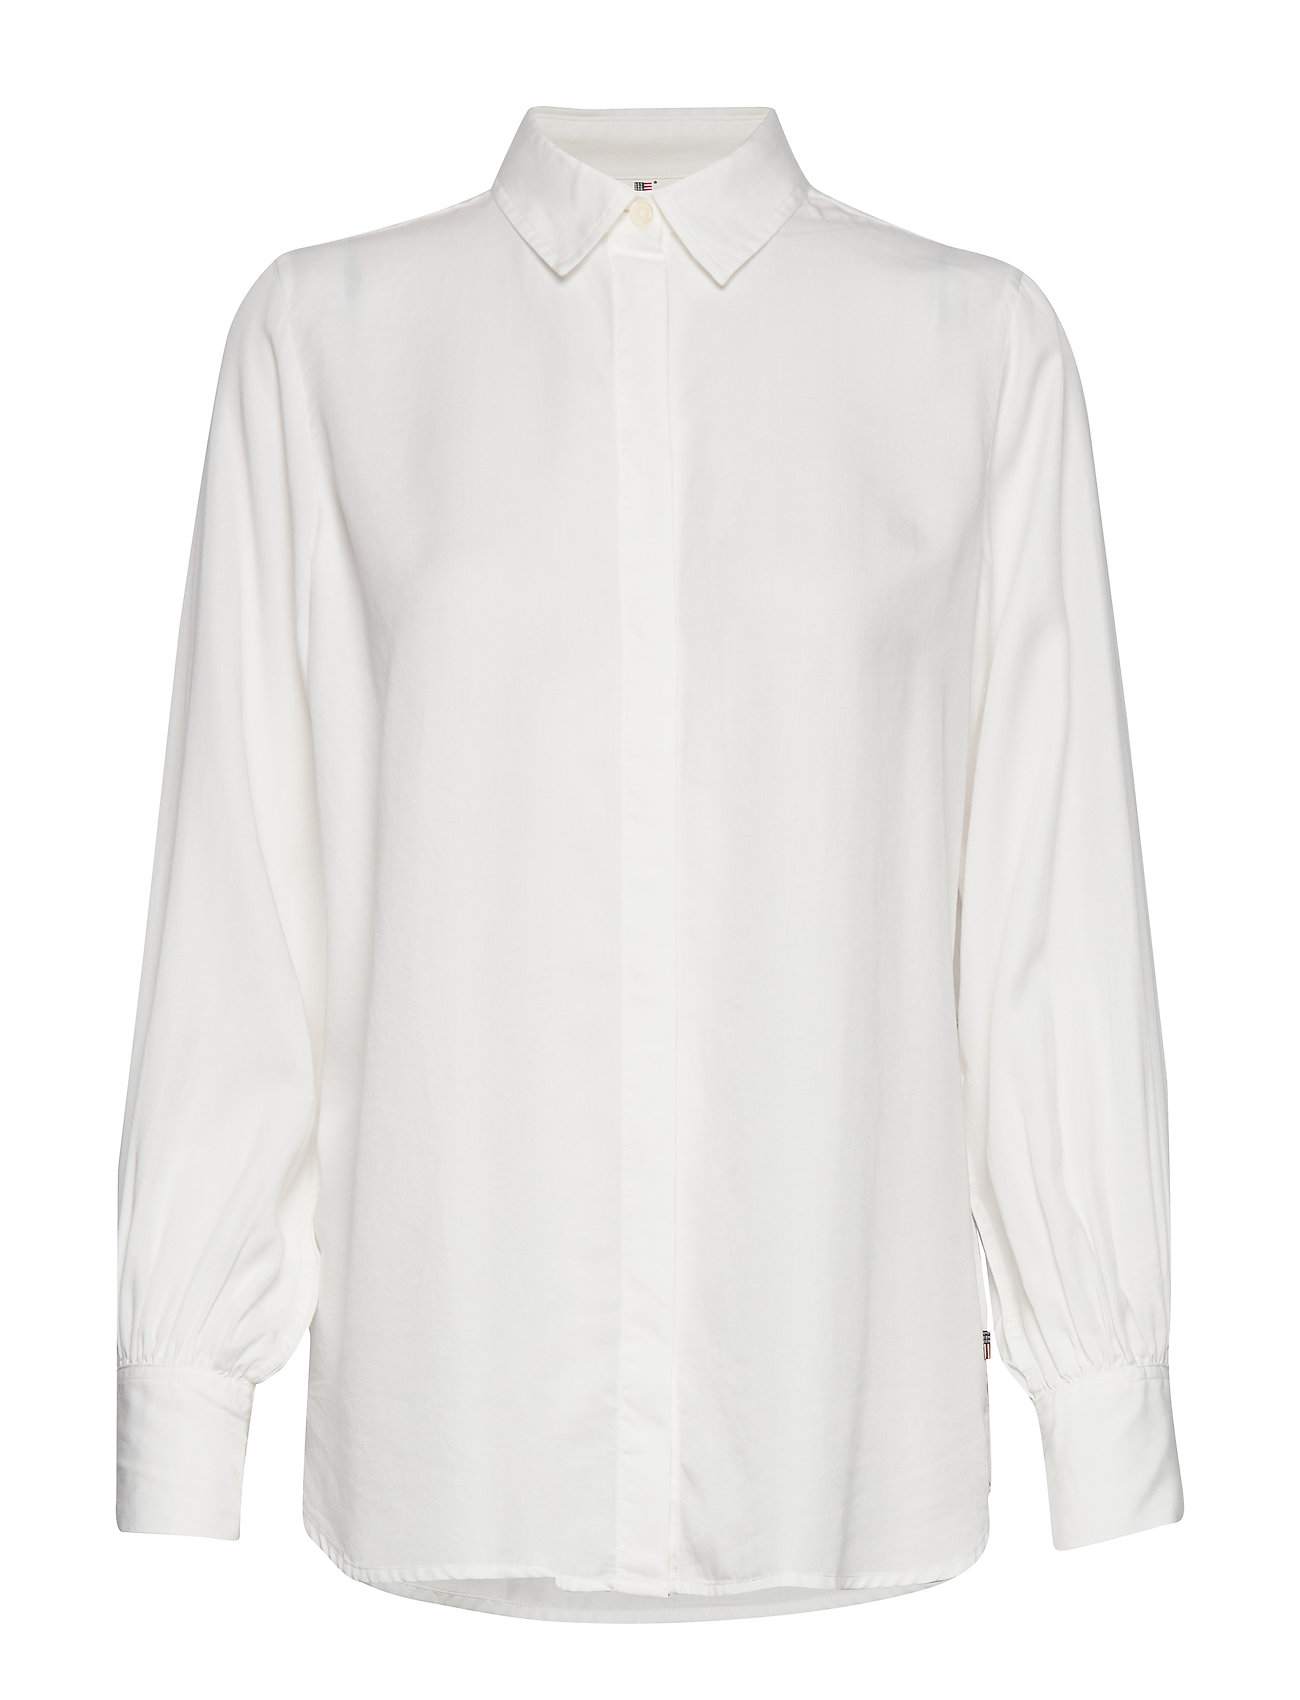 Lexington Clothing Isolde Lyocell Shirt - WHITE